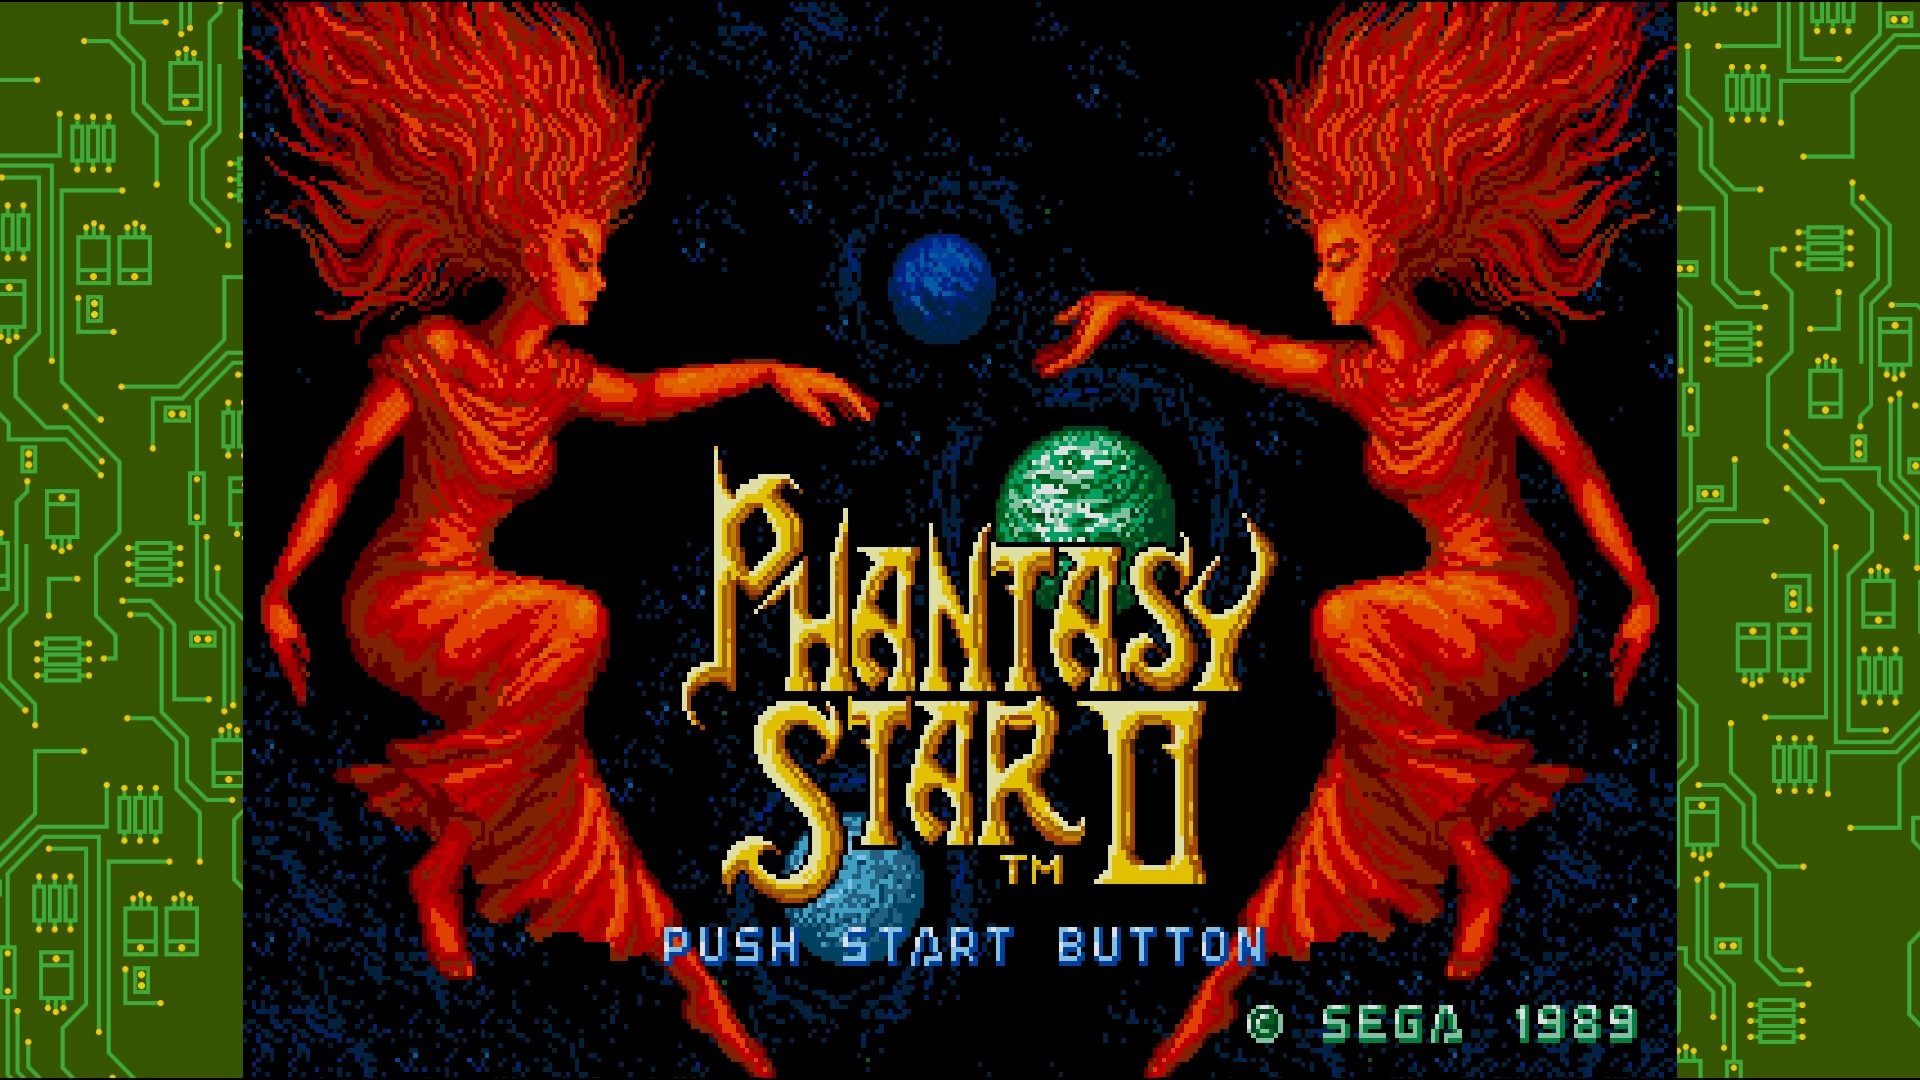 sega genesis classics ps4 game list